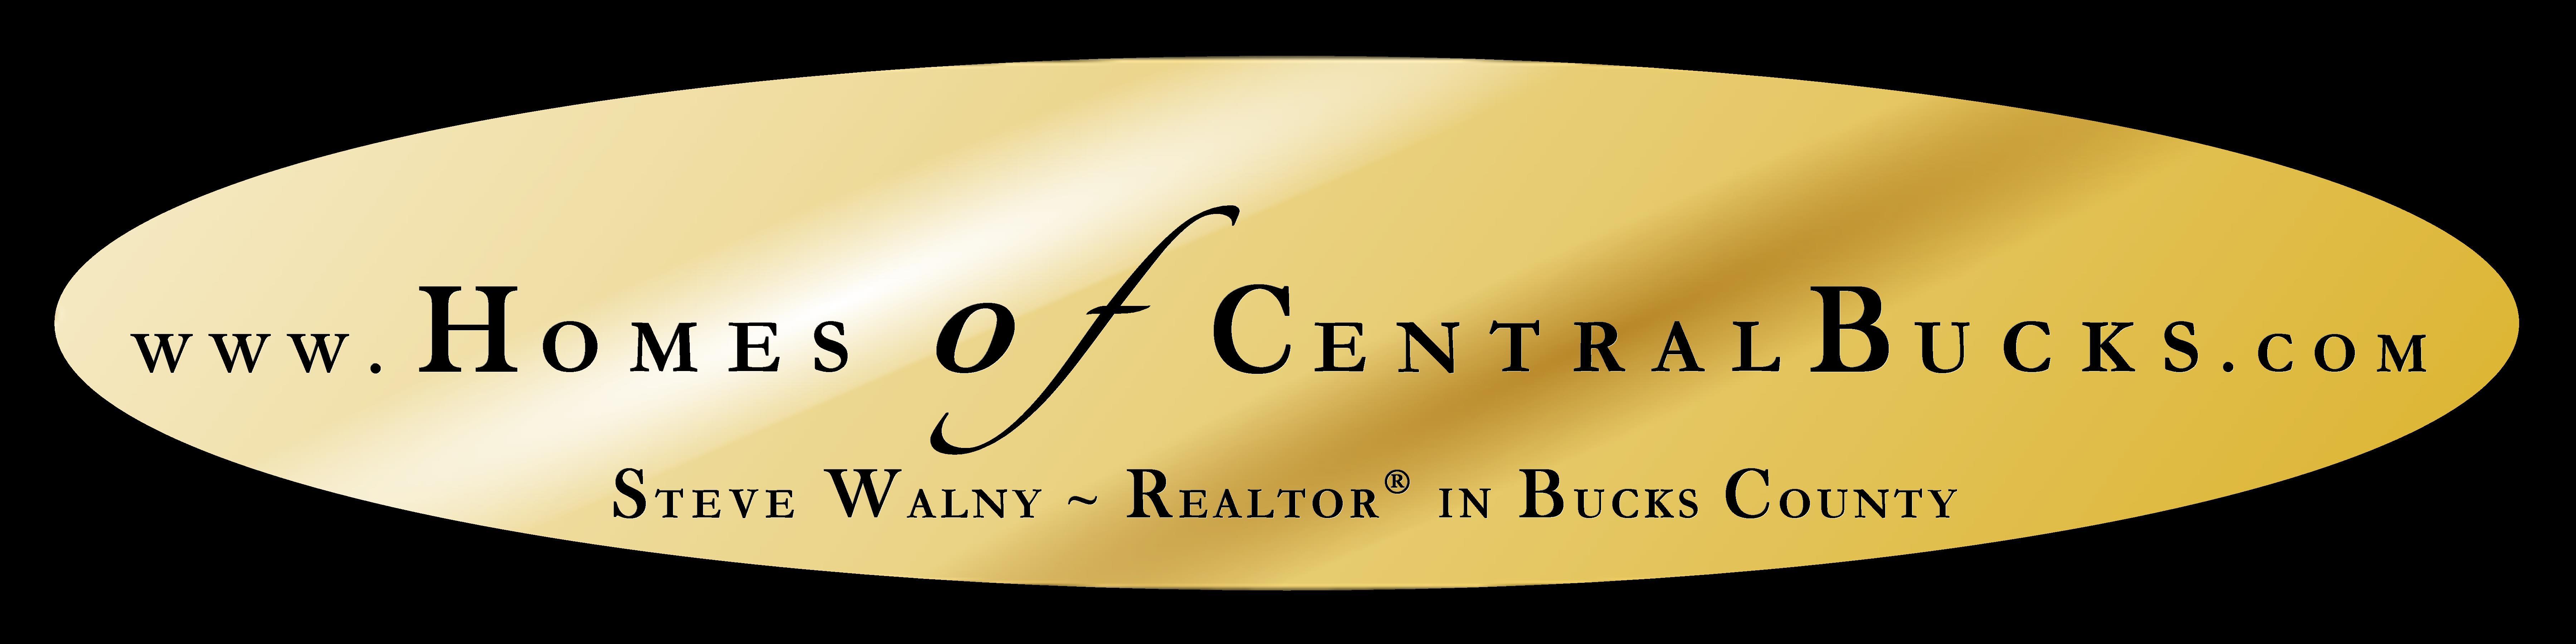 www.HomesOfCentralBucks.com | #HomesOfCentralBucks | Homes of Central Bucks | #HomesInCentralBucks | Homes in Central Bucks County for Sale | Weidel Realtors | #WeidelRealtors